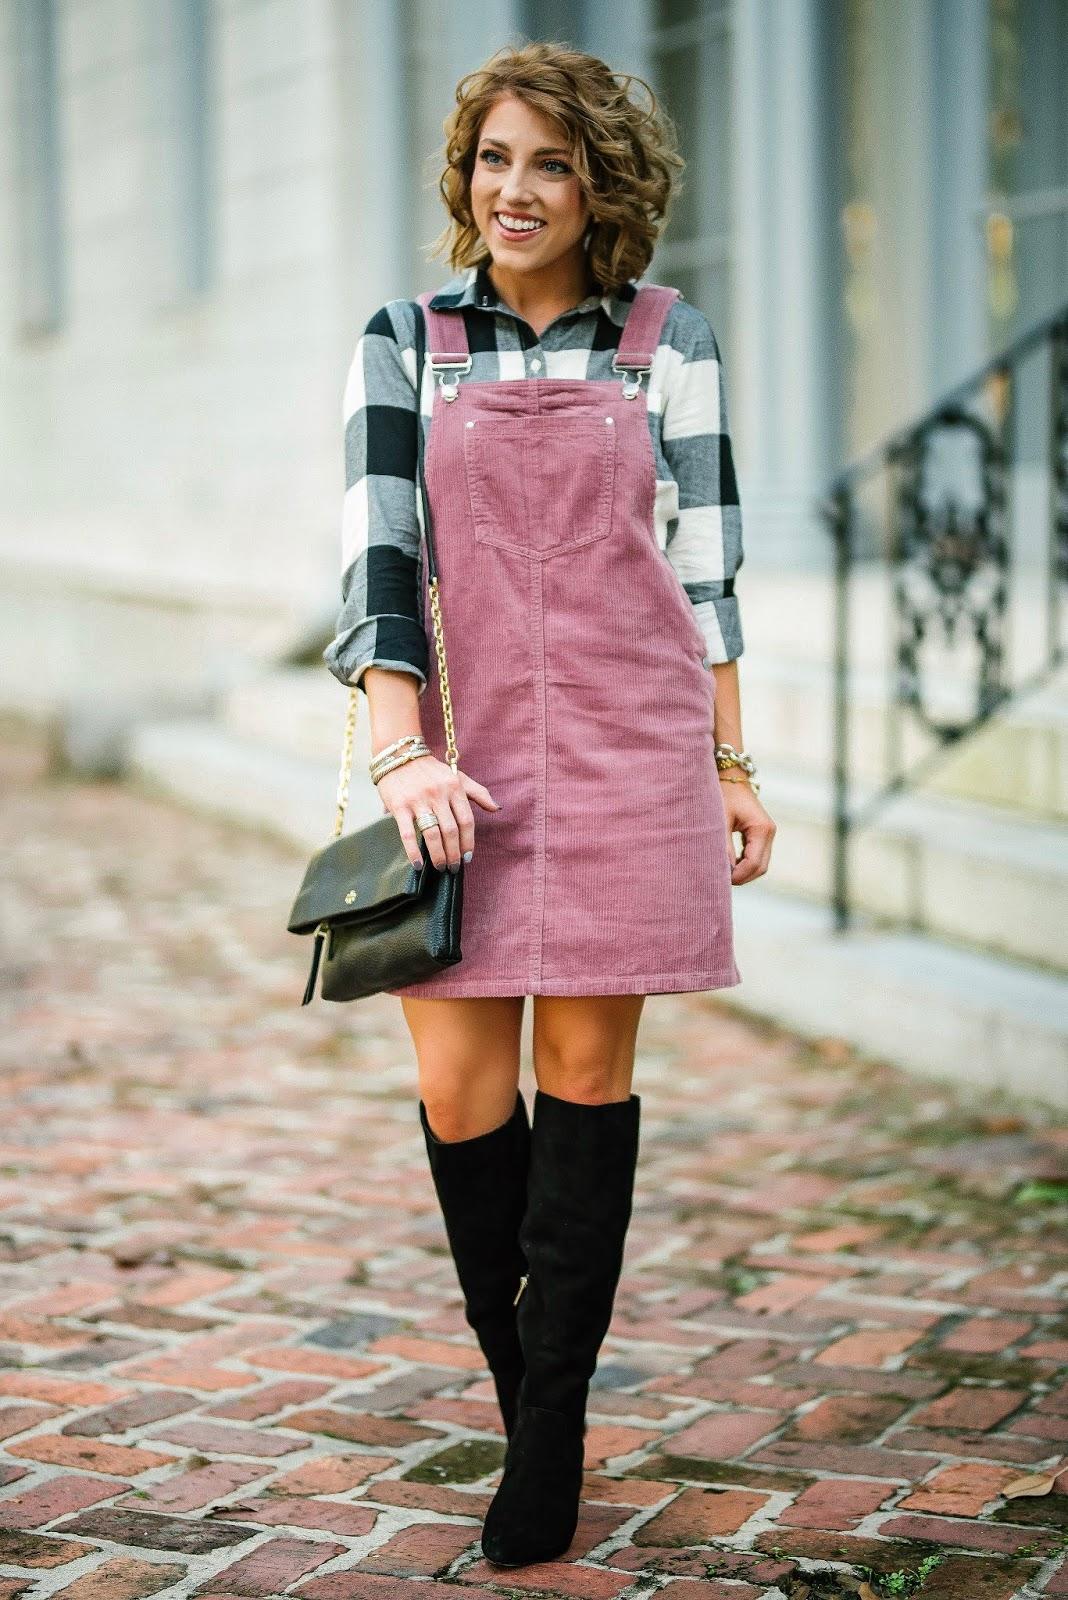 Fall Style: Pink Corduroy Pini + Black and White Plaid Shirt - Something Delightful Blog